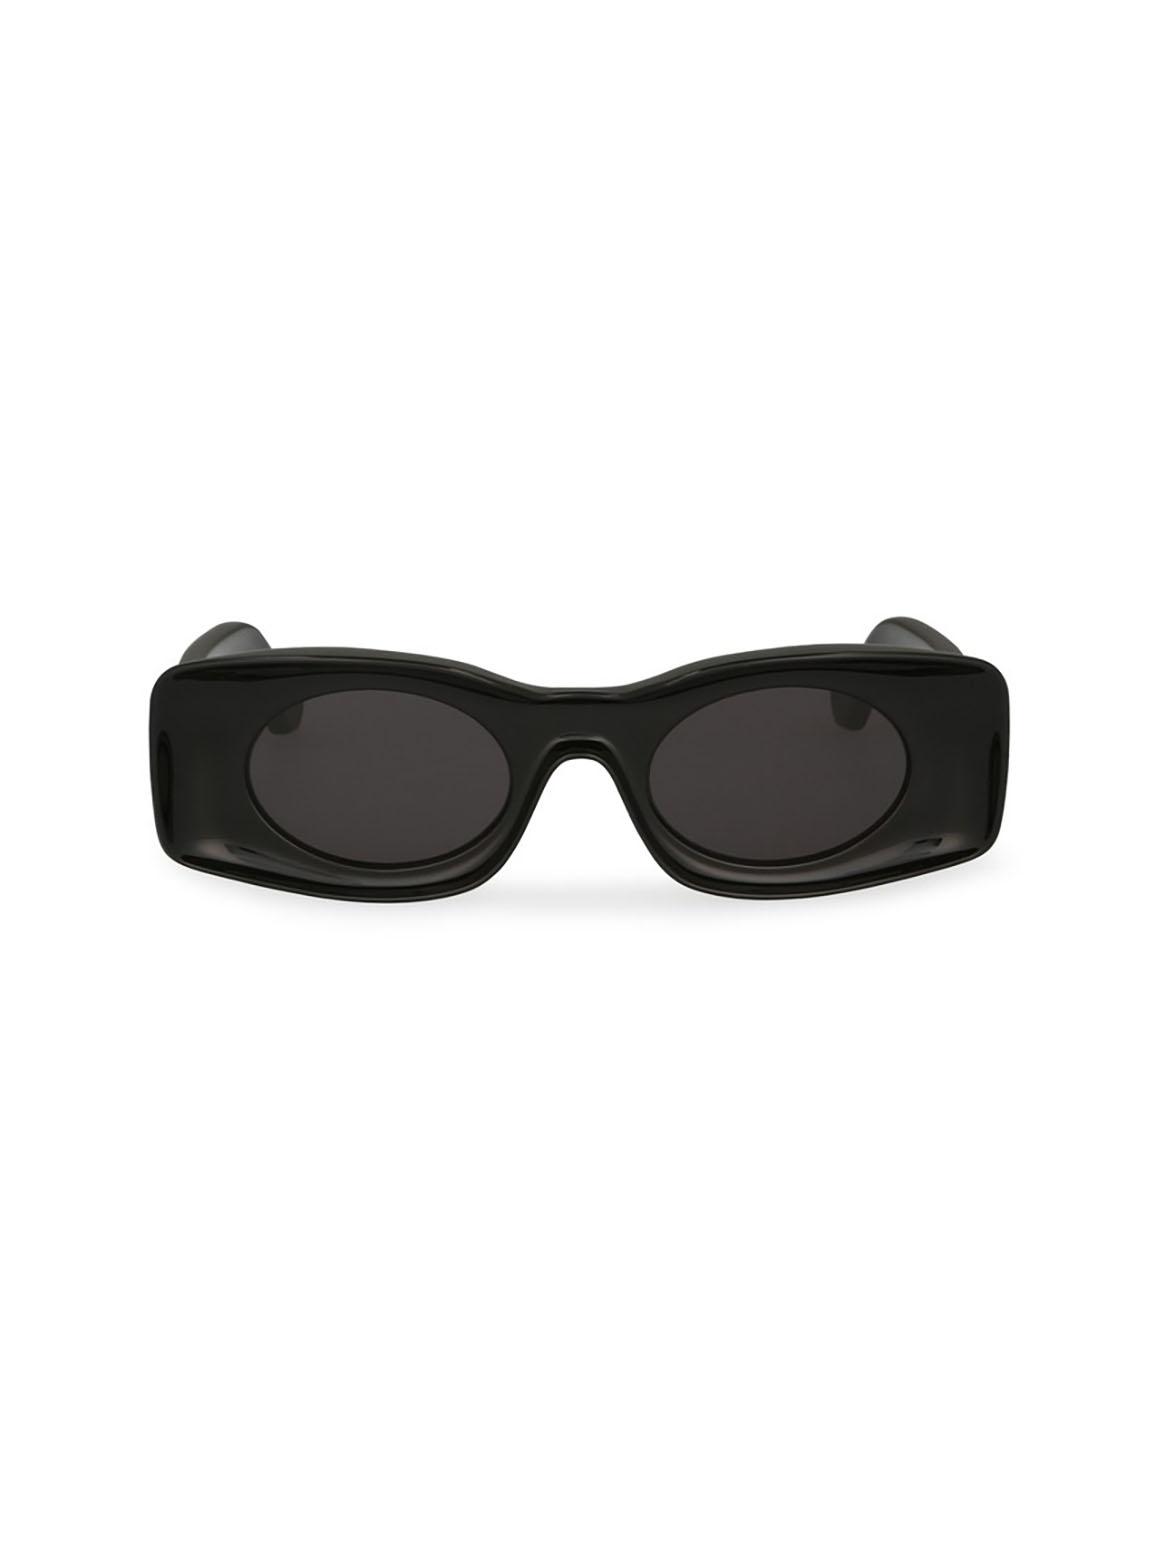 Paula's Ibiza Sunglasses